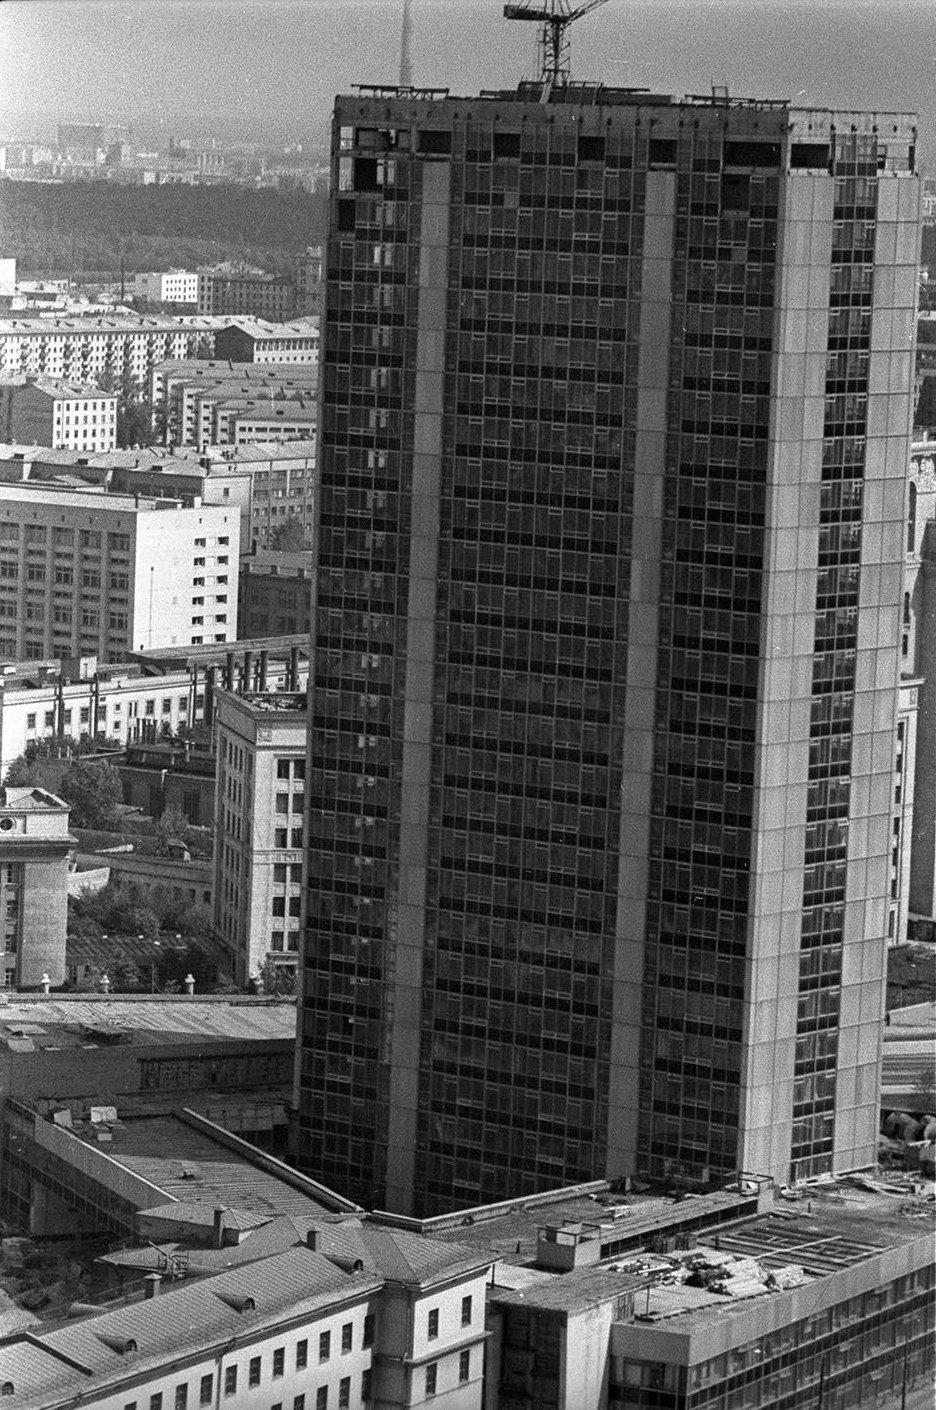 1965. Новое здание НИИ «Гидропроект». Развилка Ленинградского и Волоколамского шоссе